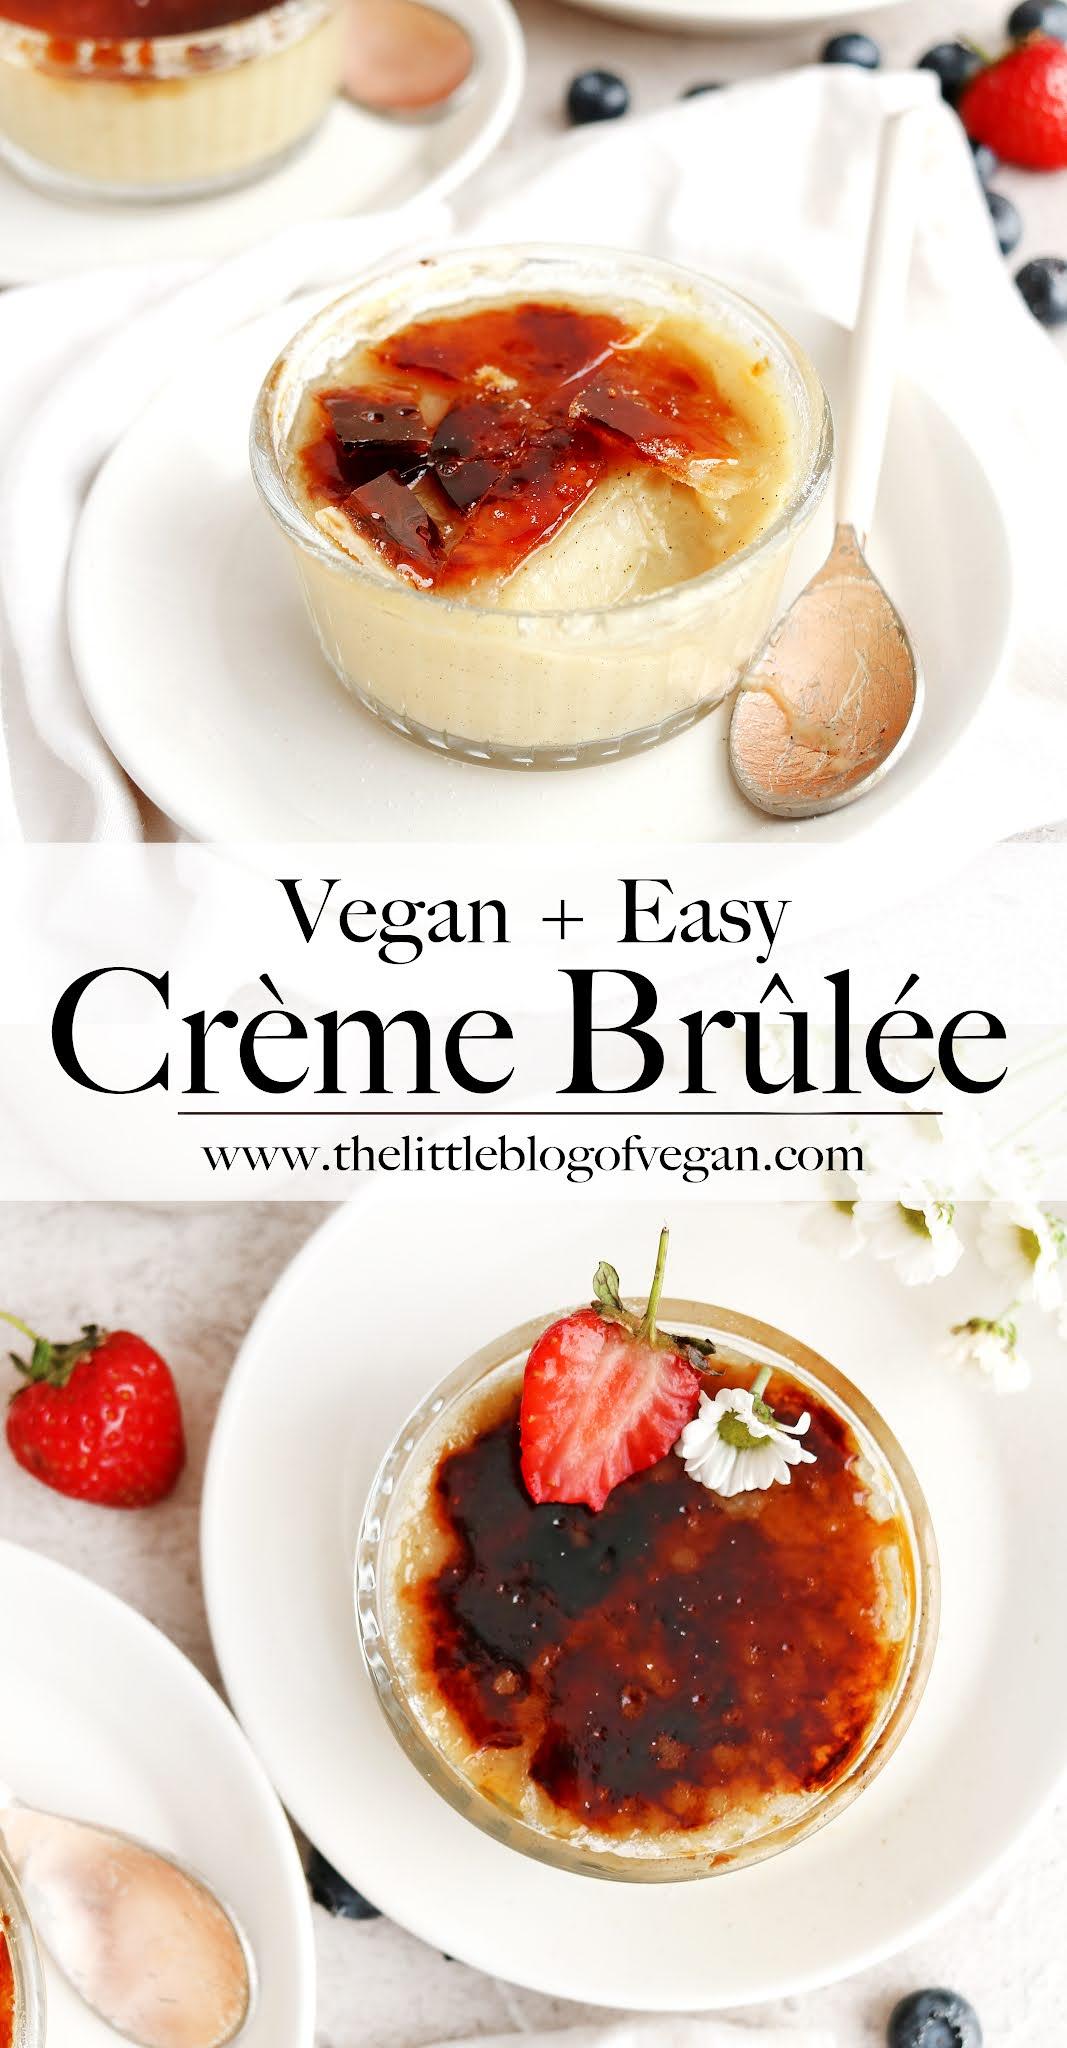 Vegan Creme Brulee on plates